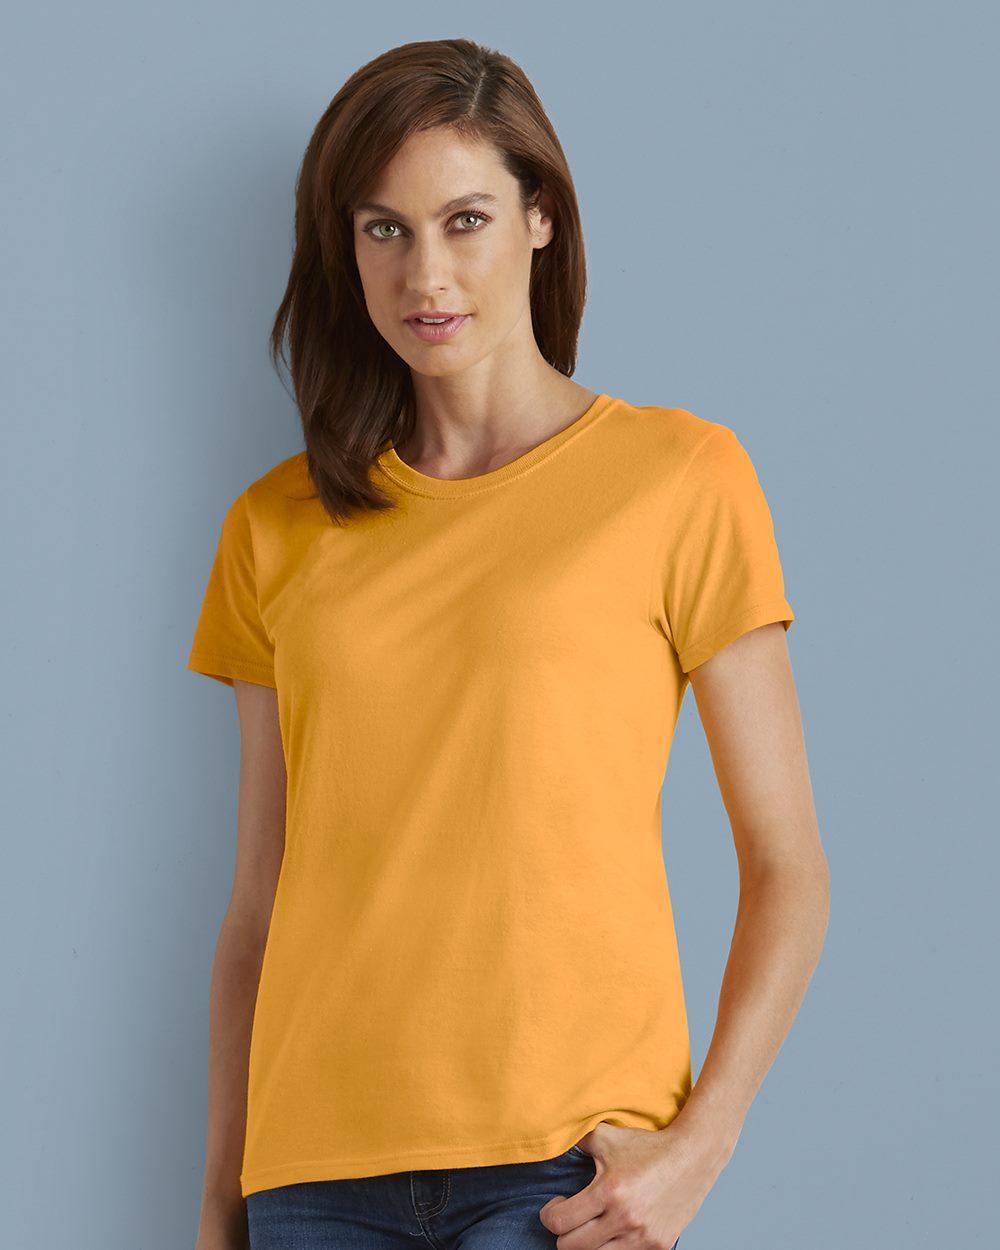 Gildan 5000l Heavy Cotton Women S Short Sleeve T Shirt Friendly